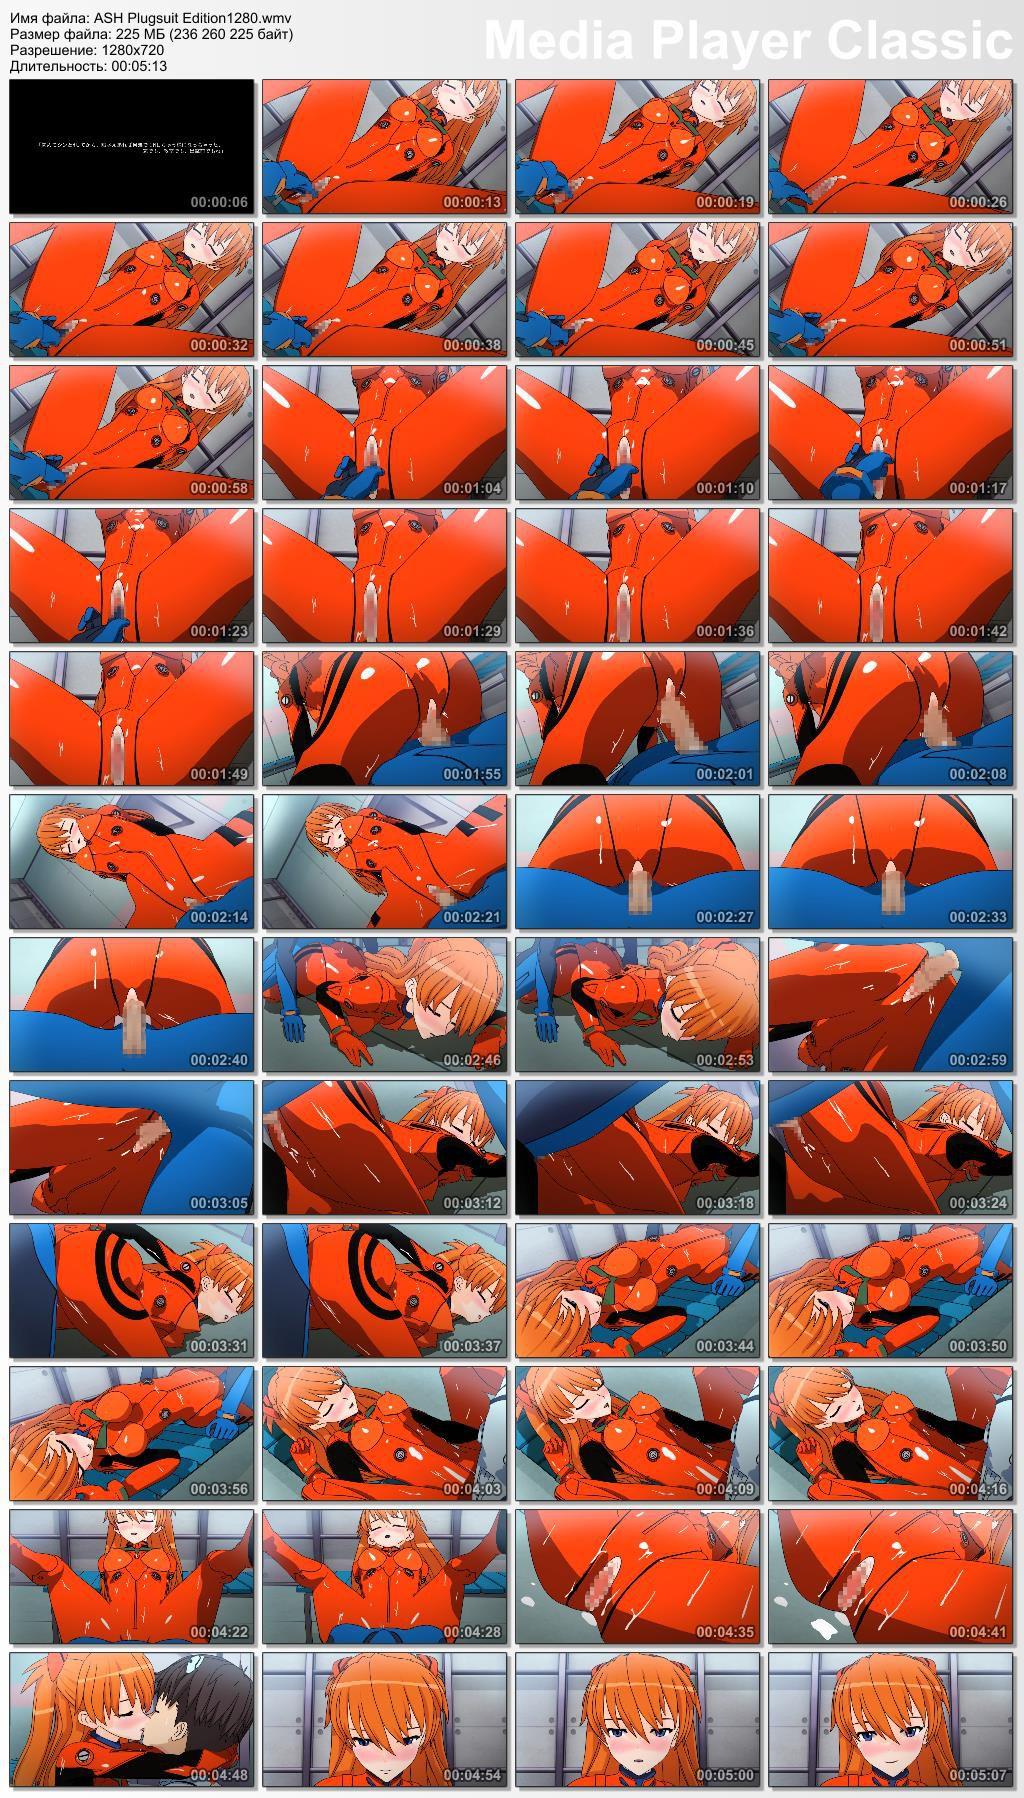 ASH Plugsuit Edition / Evalgelion [Ep.1] [3D] [JAP] Anime Hentai